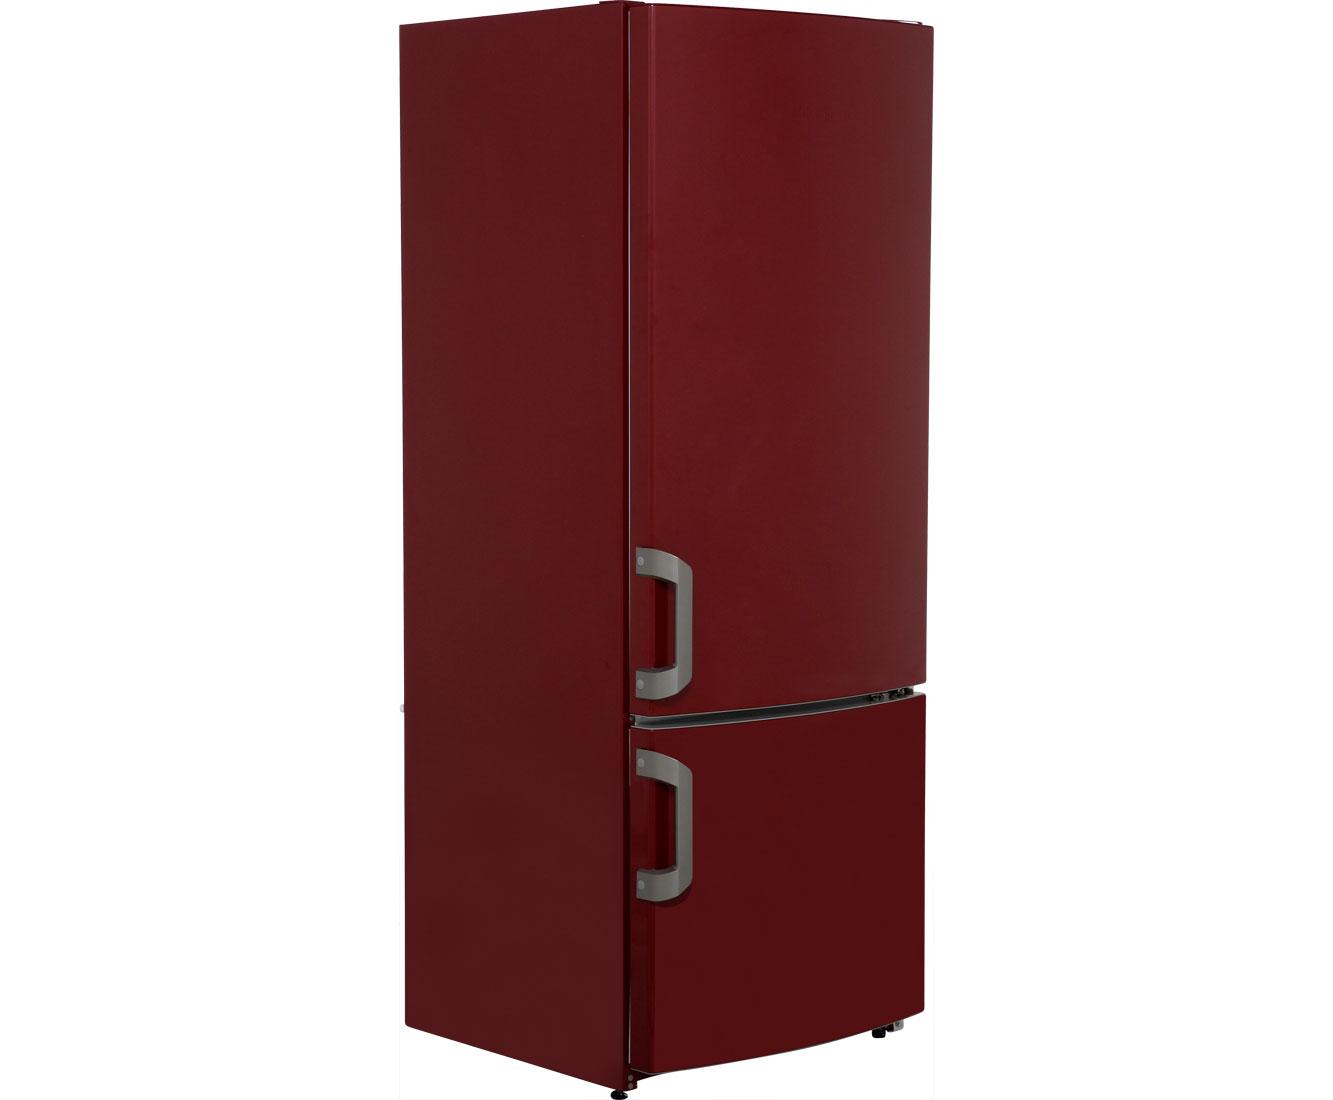 Gorenje Kühlschrank Creme Retro : Gorenje kühlschrank gefrierkombination gorenje nrc tx